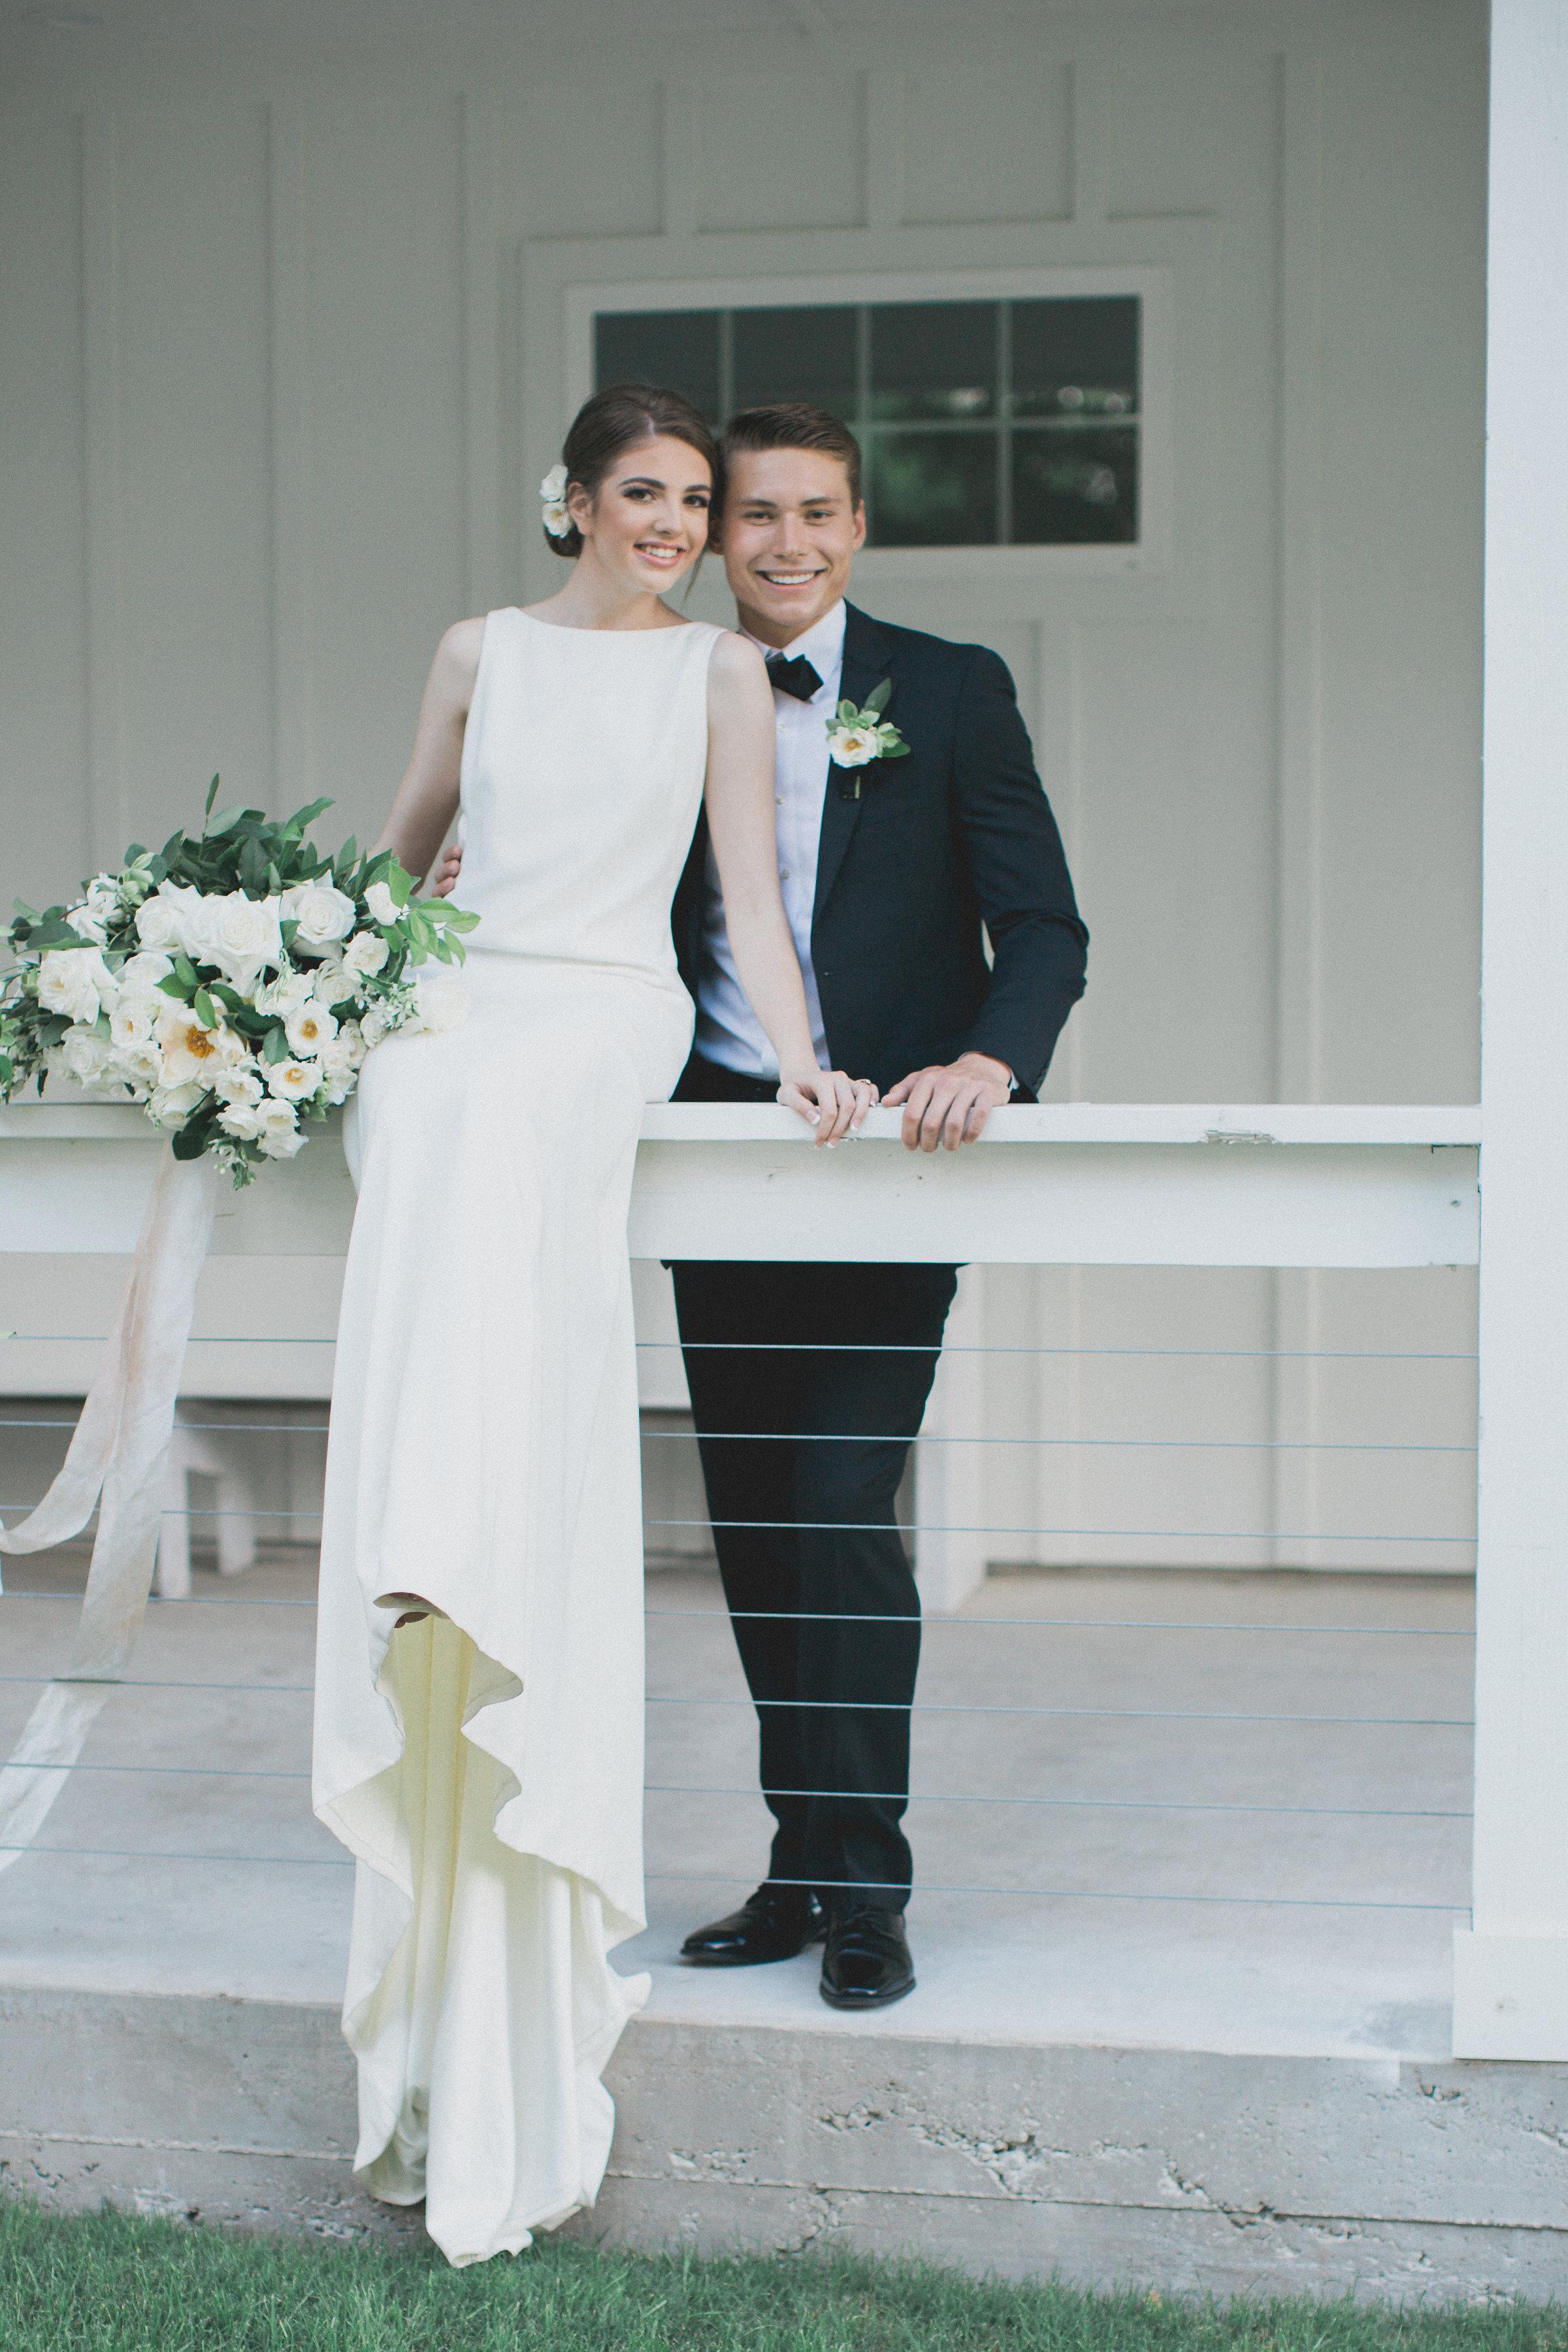 Classic Southern Elegance | Southern Summer White Barn Wedding in Dallas, TX